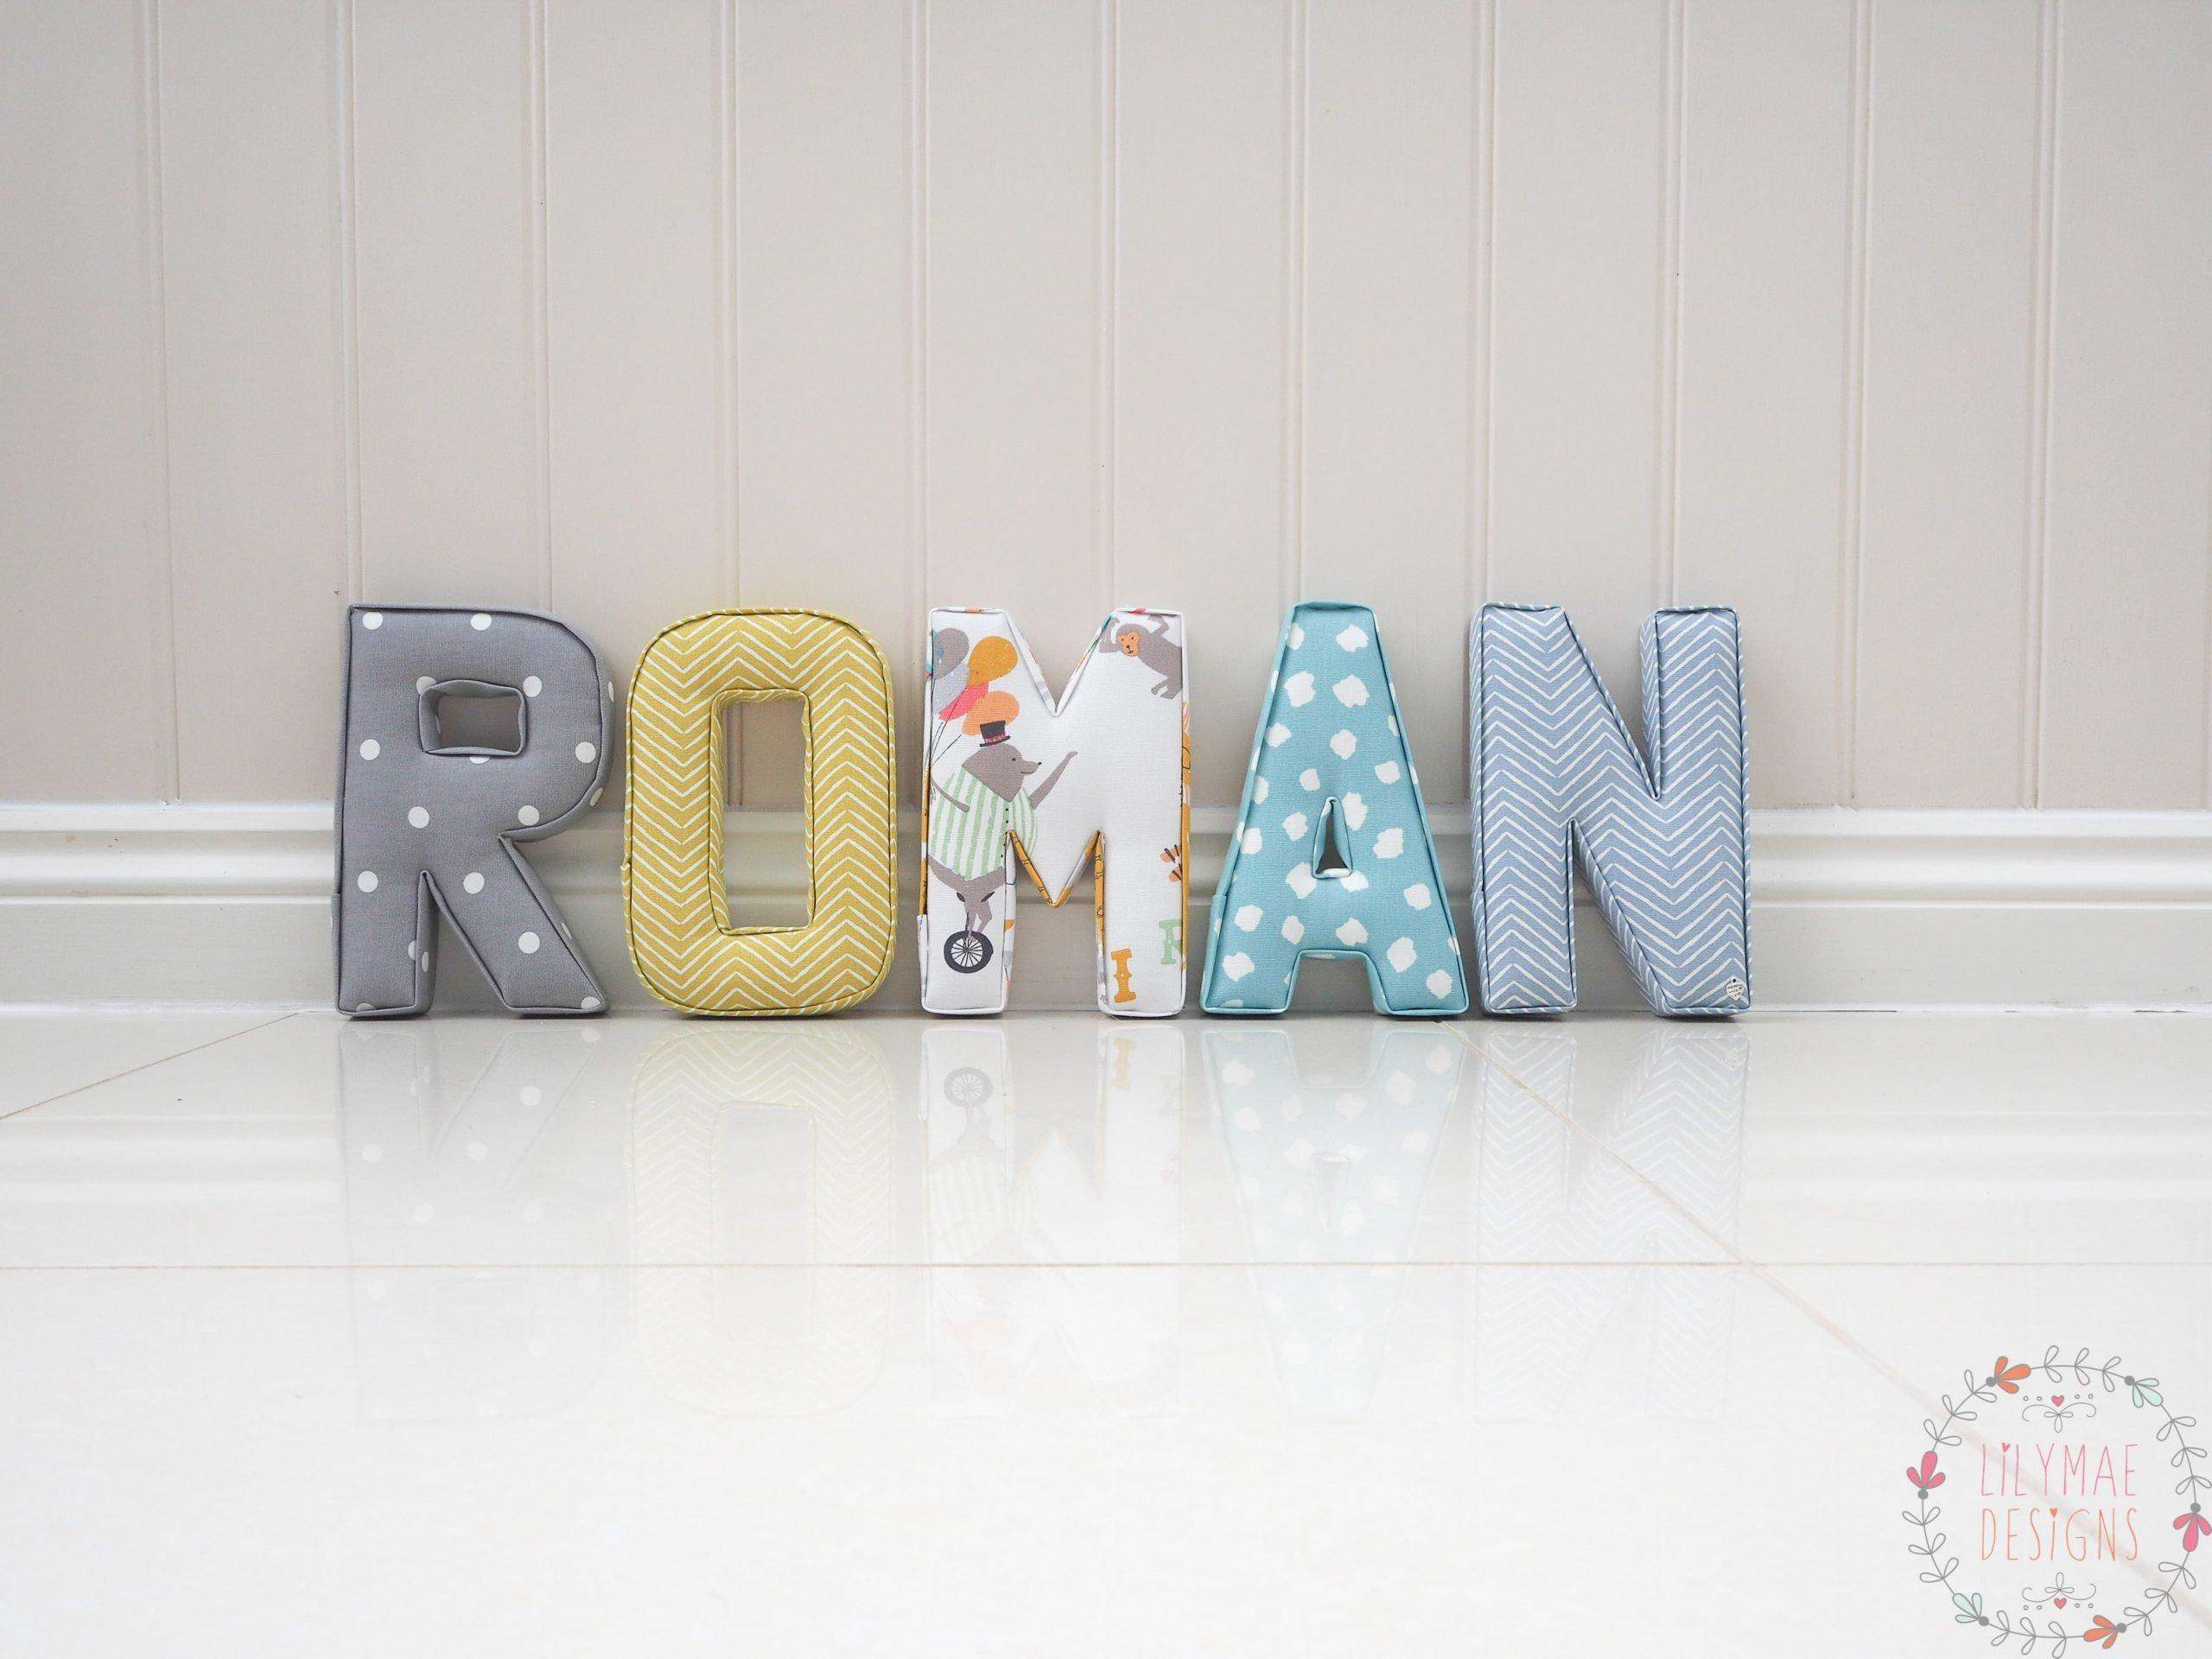 Roman Nameset R Dotty Smokey Grey, O Pica Citrus, M Circus Roll Up, A Clio Aqua, N Pica Chambray